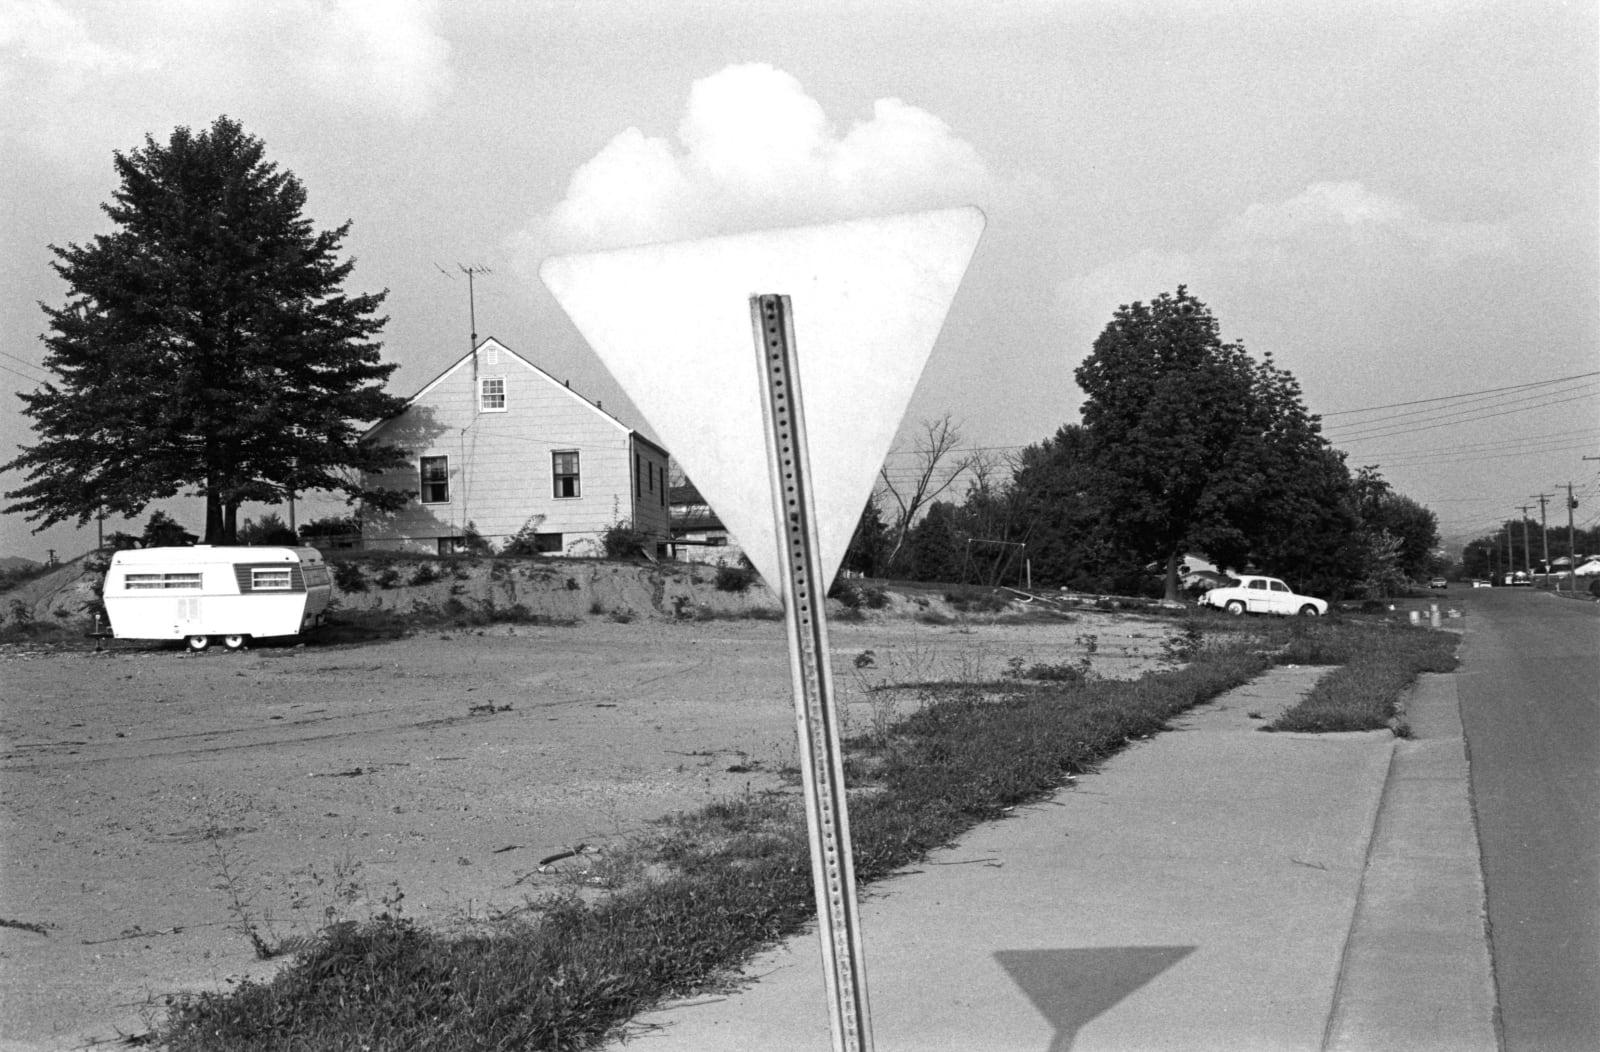 Lee Friedlander - Knoxville, Tennessee, 1971